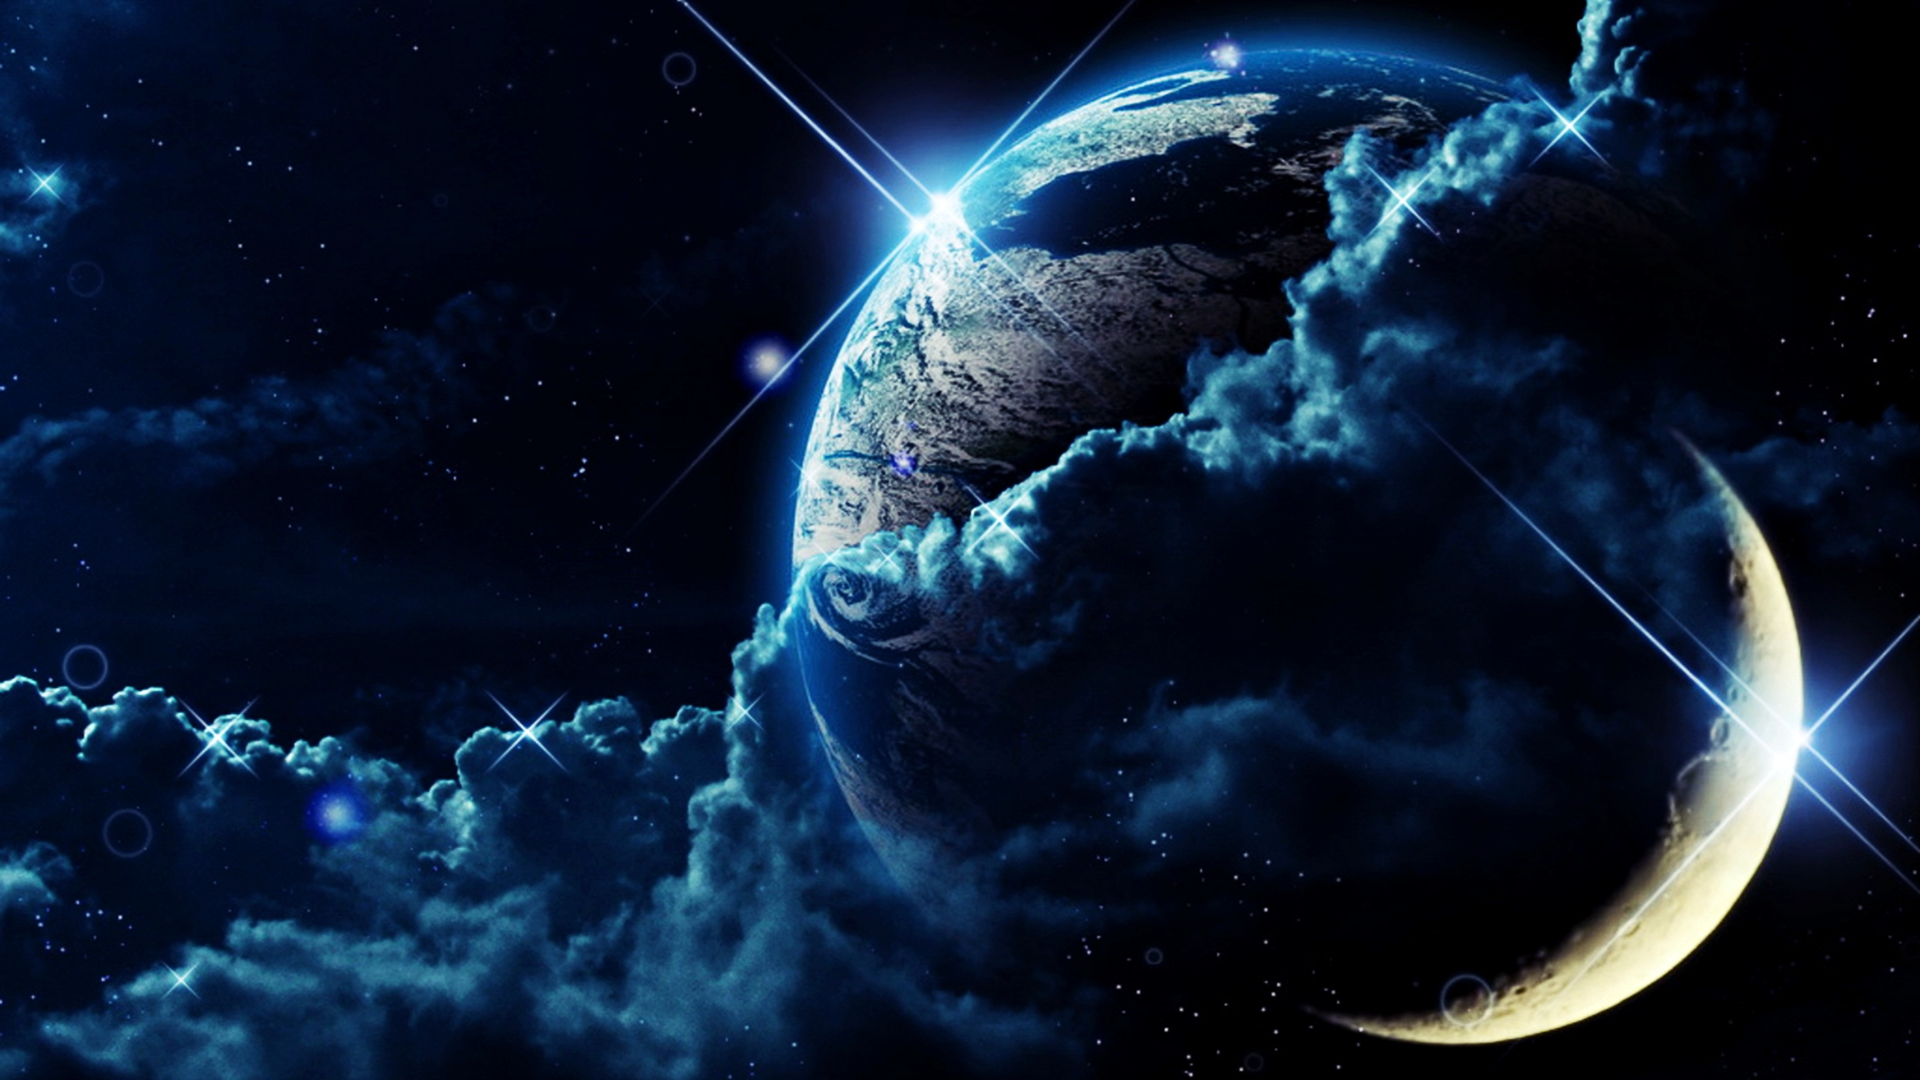 earth wallpaper hd 1080p - photo #10